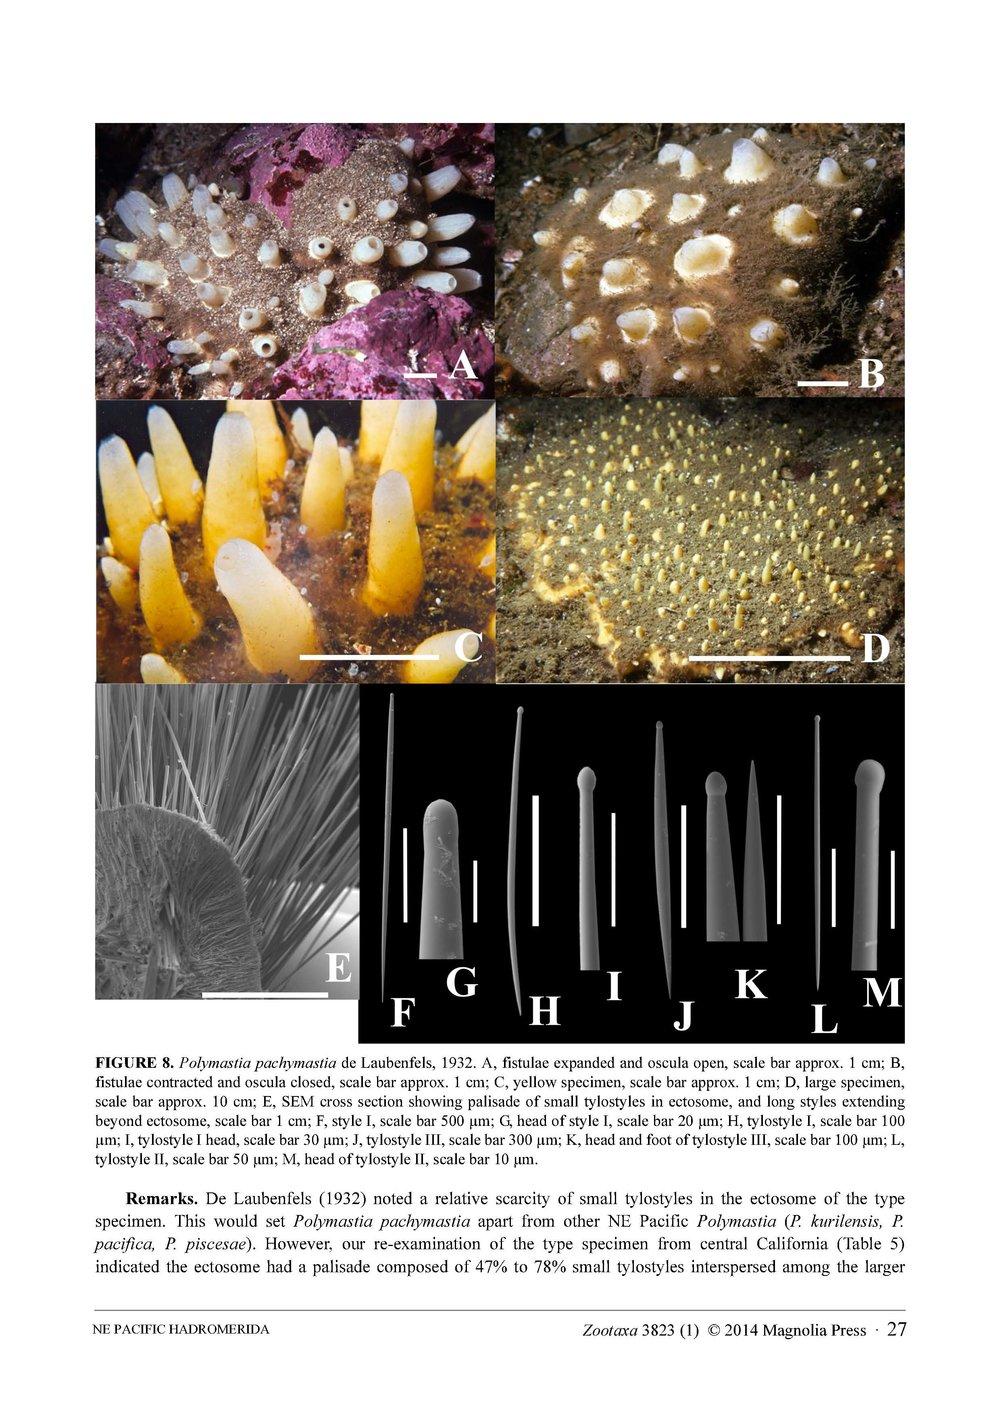 Austin et al 2014 NE Pacific Hadromerids_Page_27.jpg